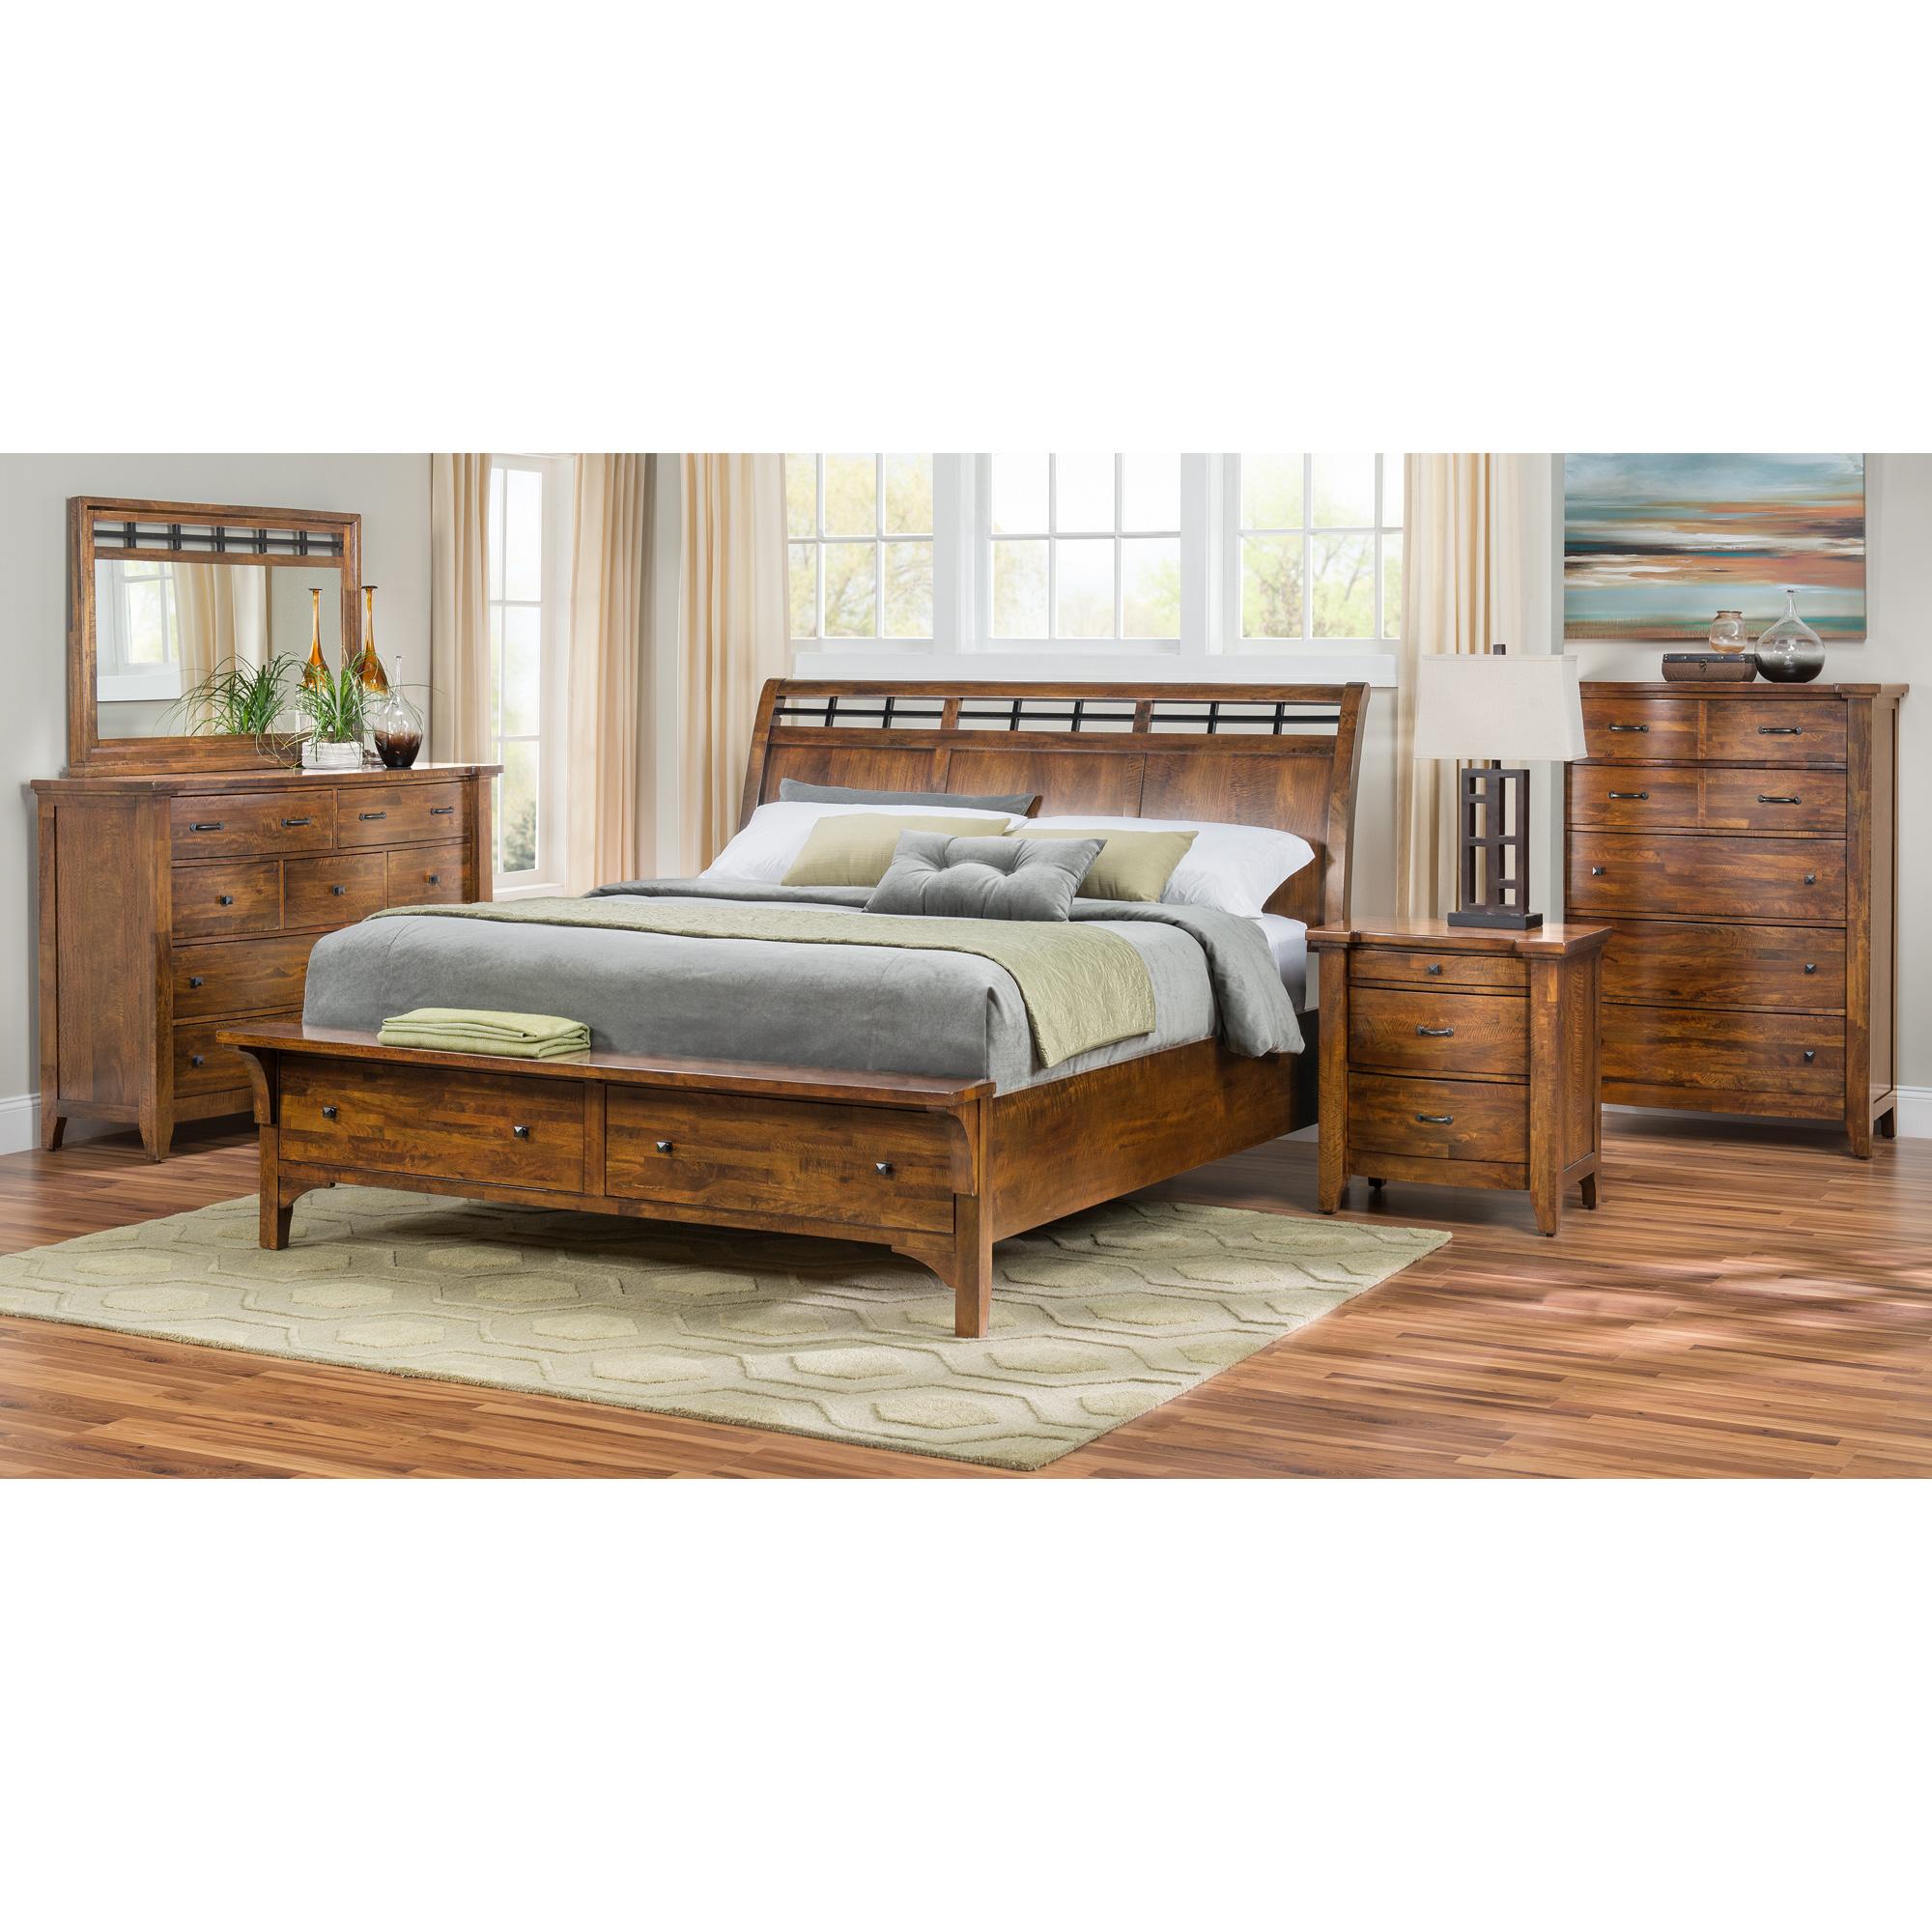 Napa Furniture | Whistler Retreat Dark Walnut Queen Storage 4 Piece Room Group Bedroom Set